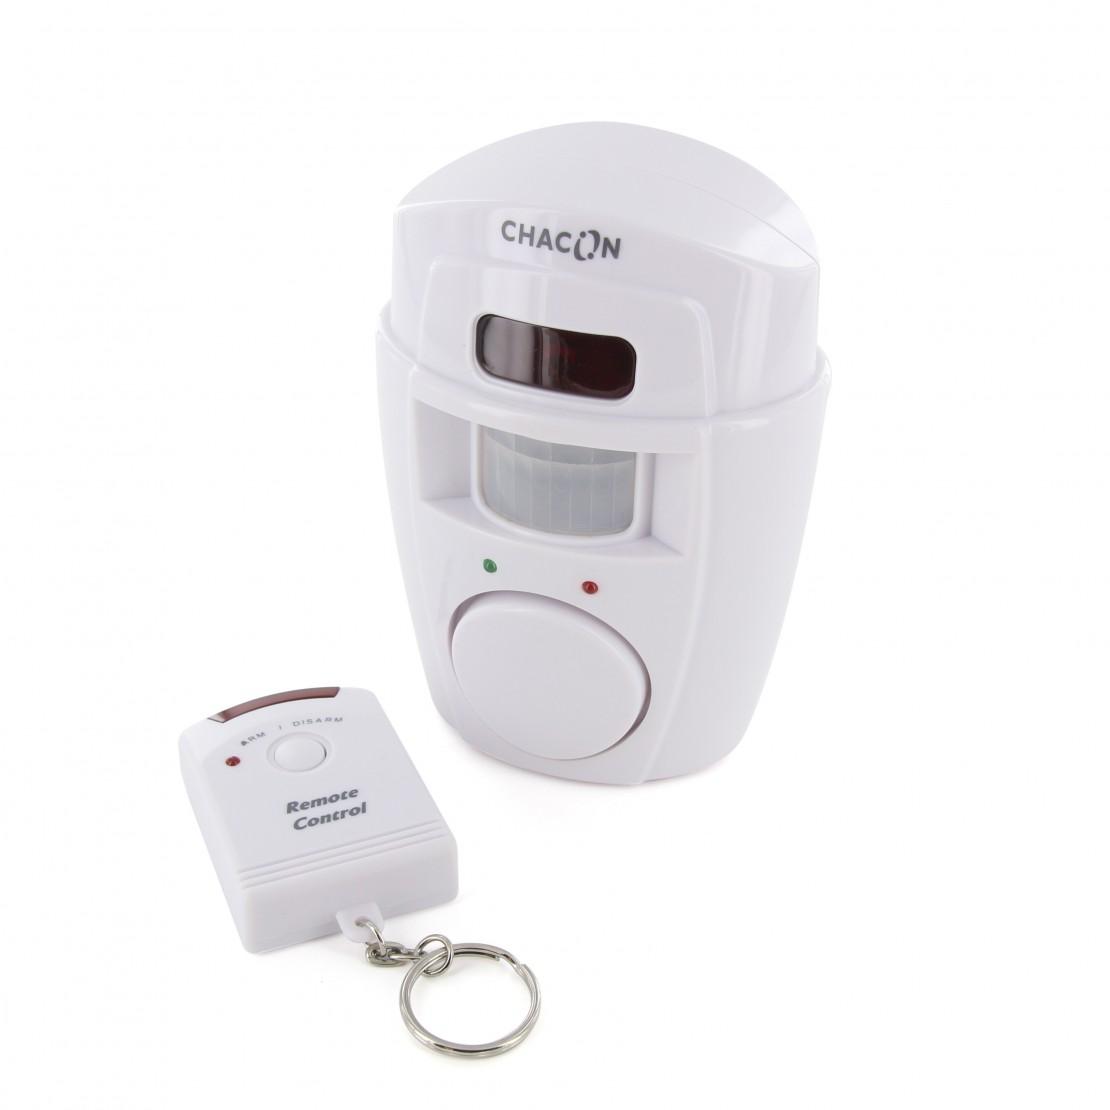 Alarm met bewegingsdetector en afstandsbediening